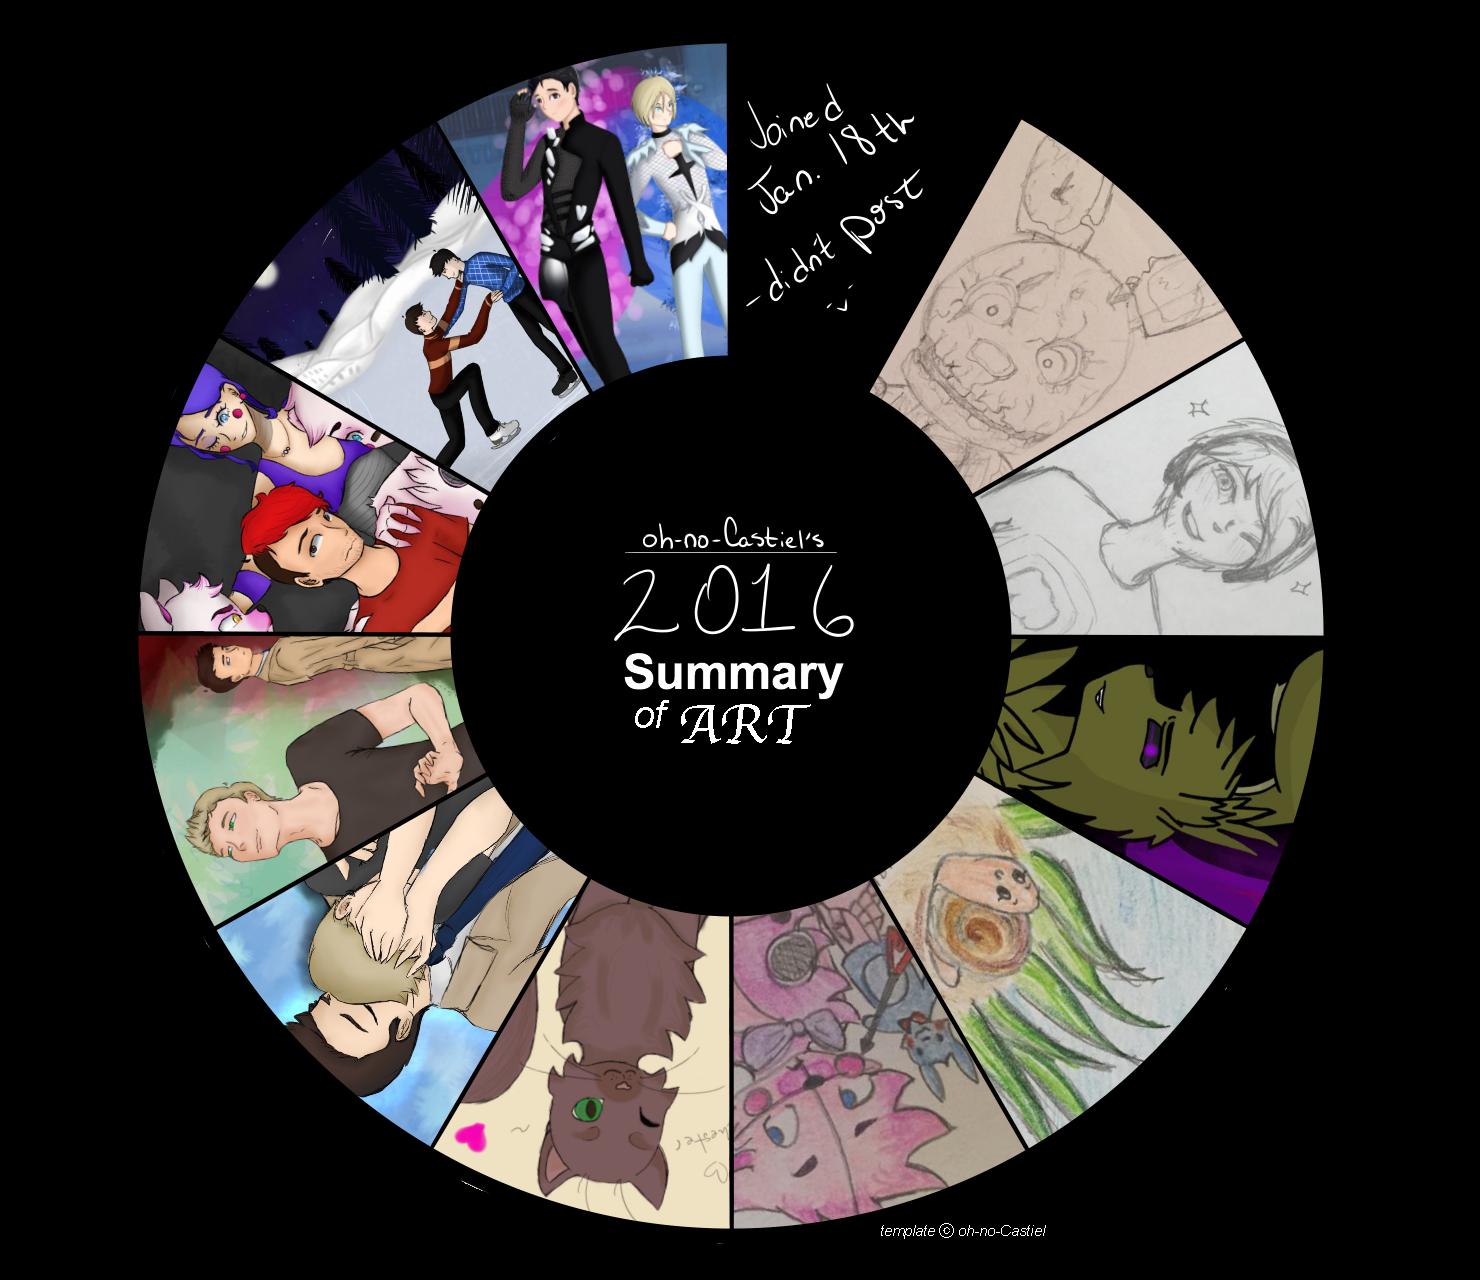 My Summary of Art 2016 by oh-no-Castiel